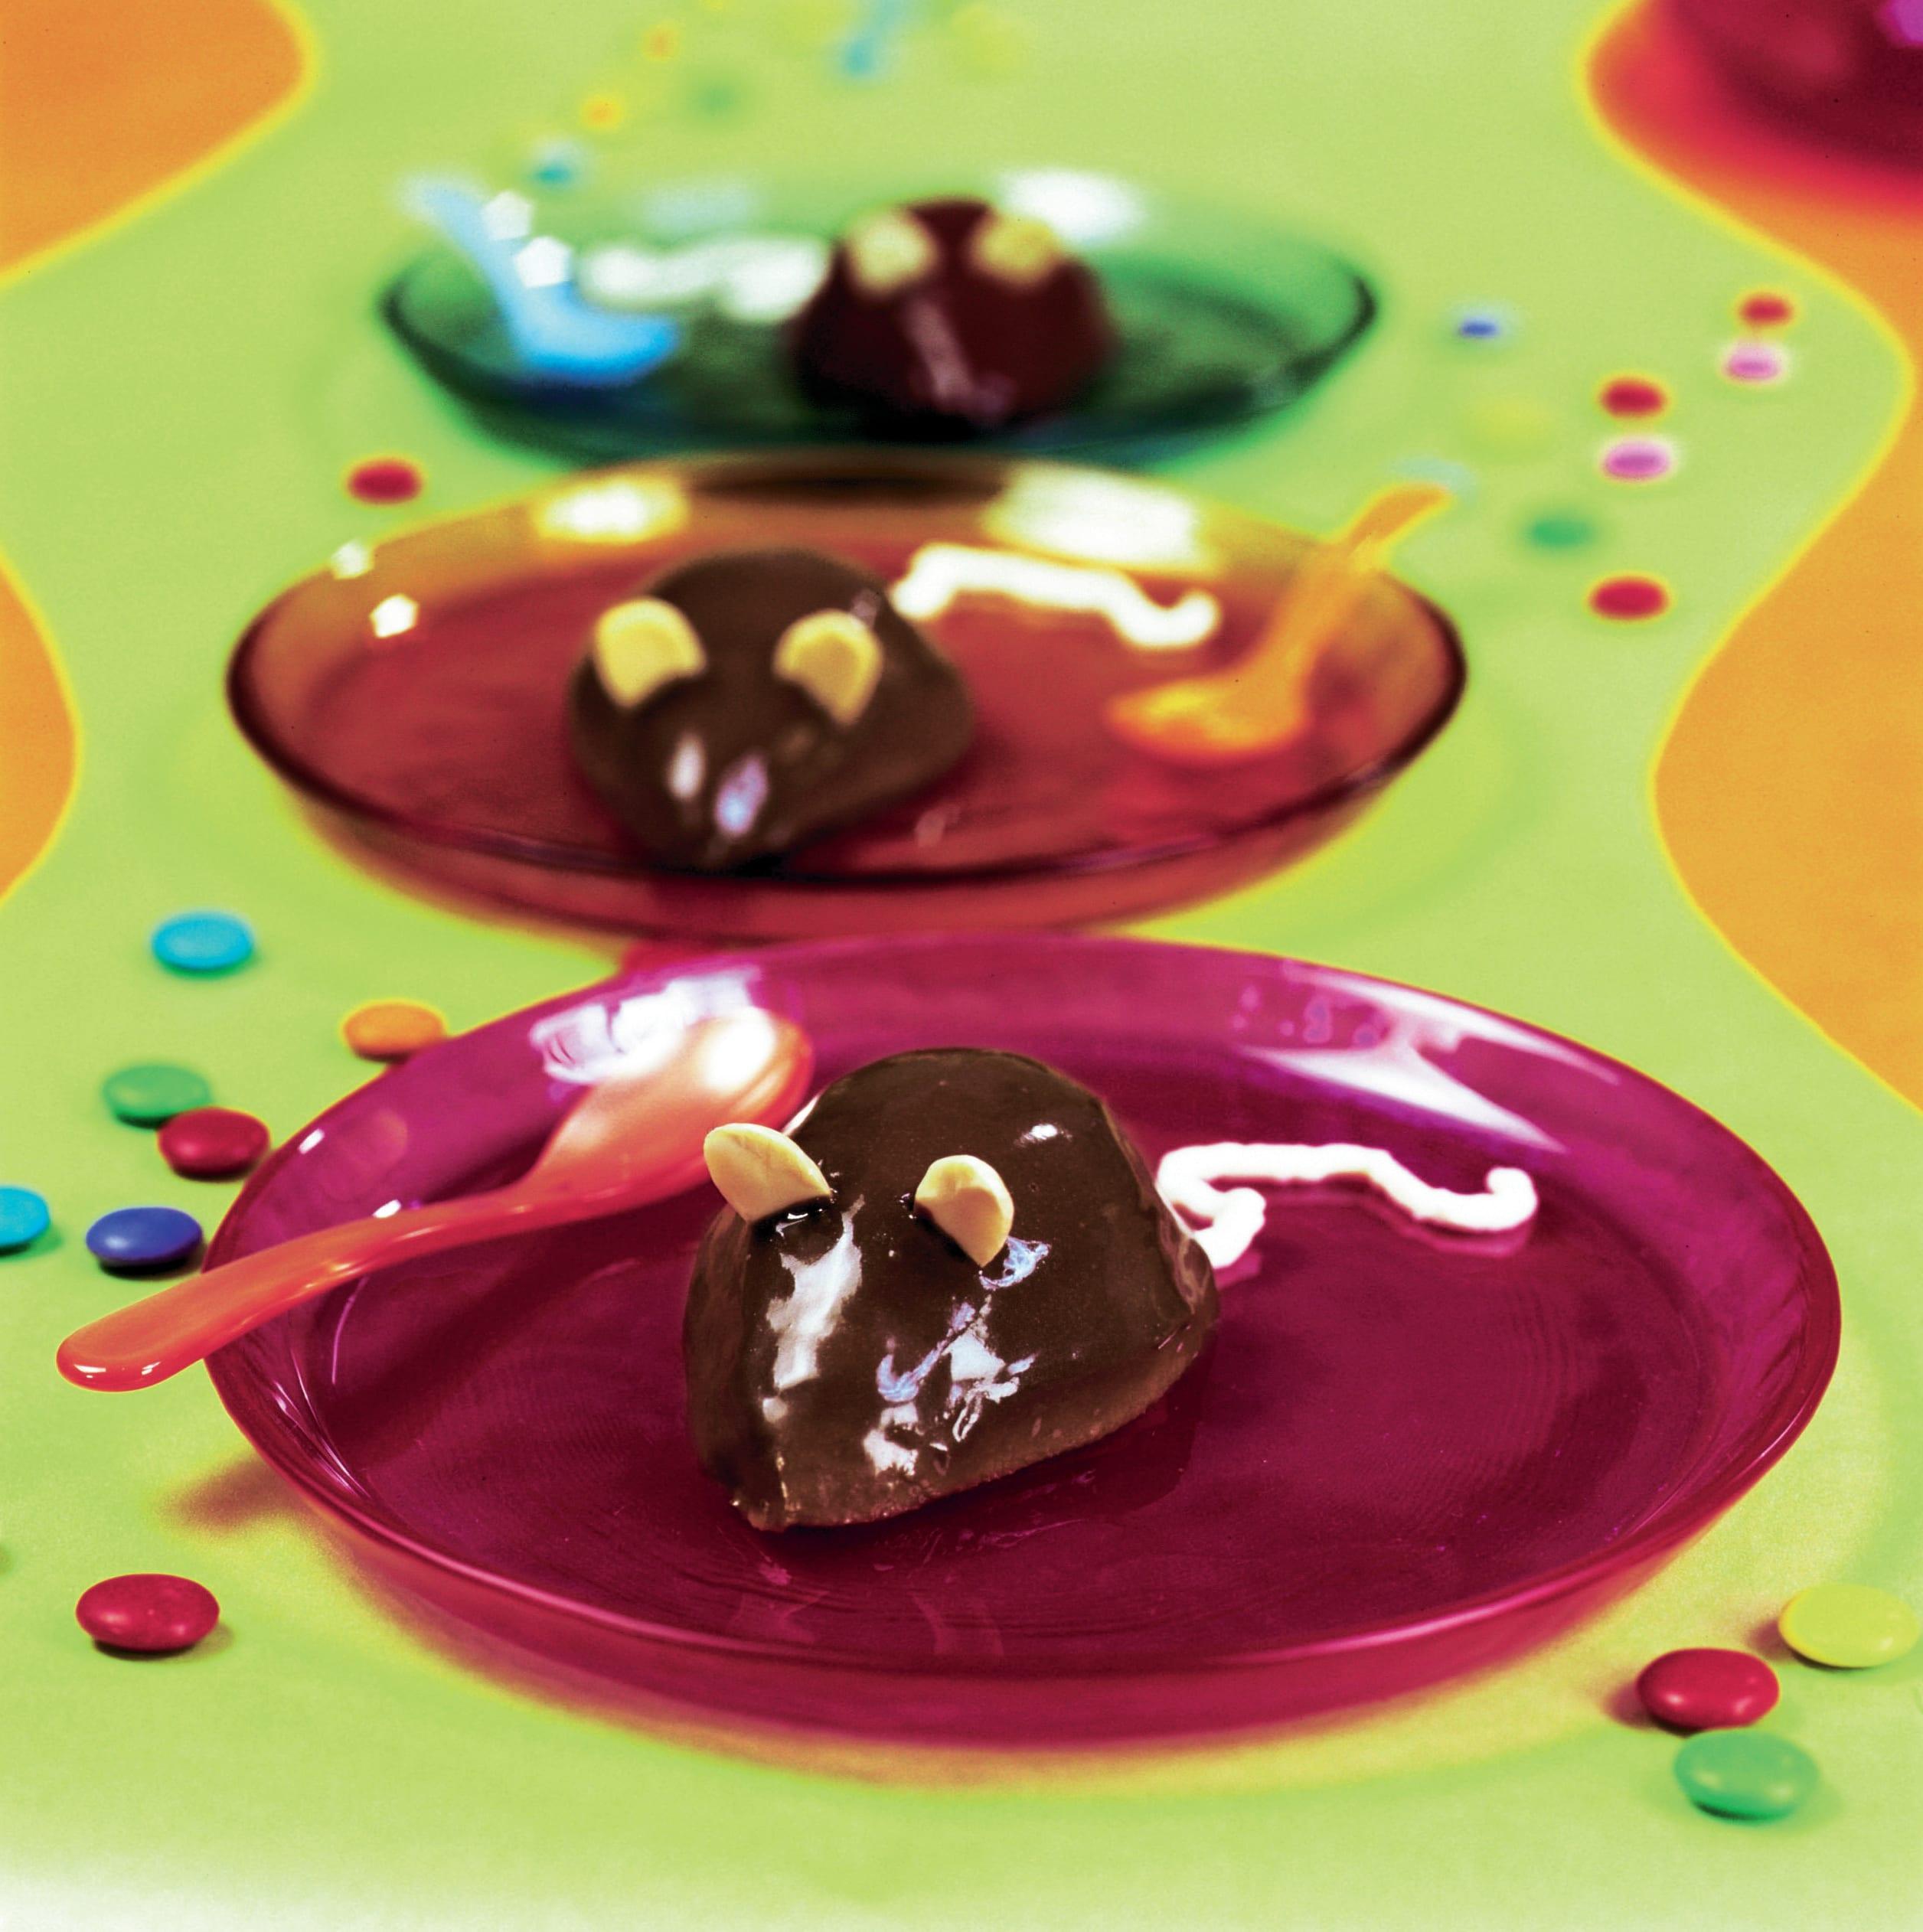 Souris au chocolat